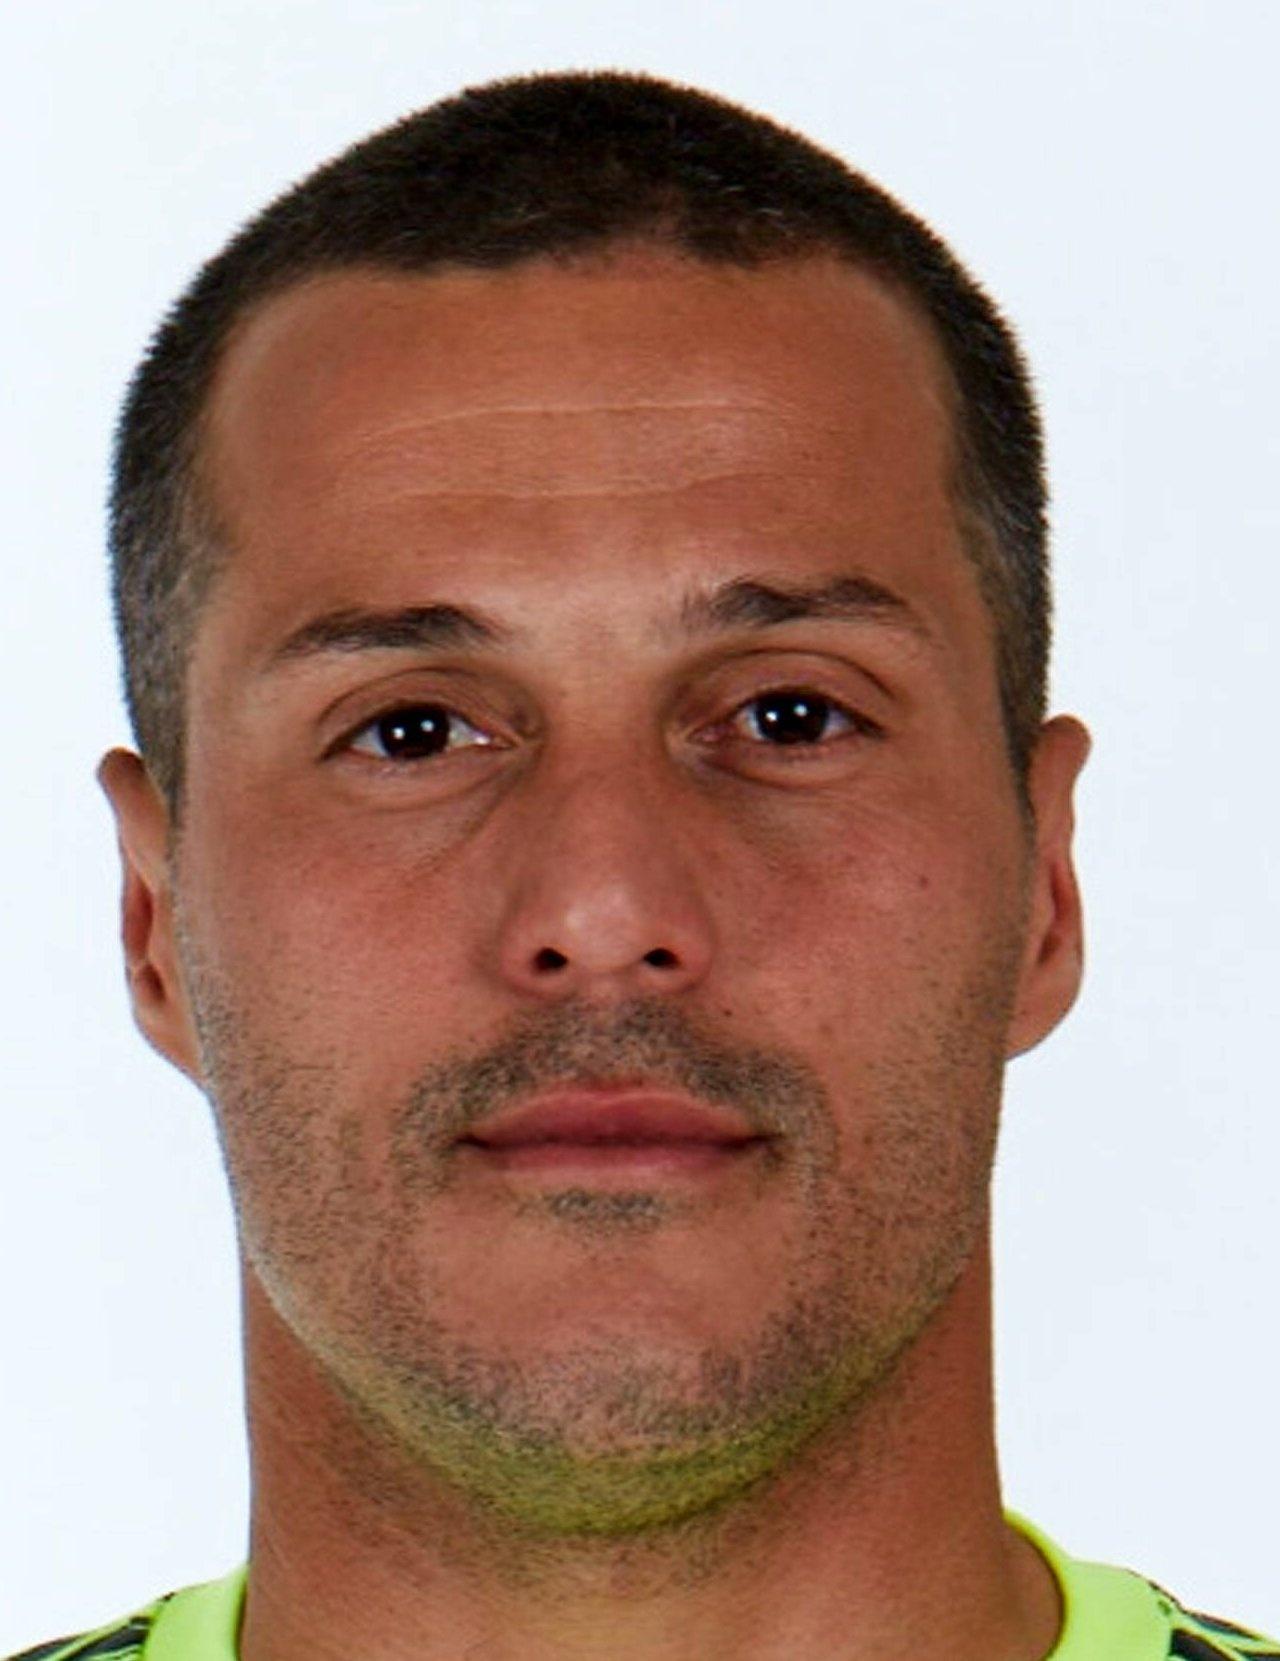 Júlio César - Player profile | Transfermarkt